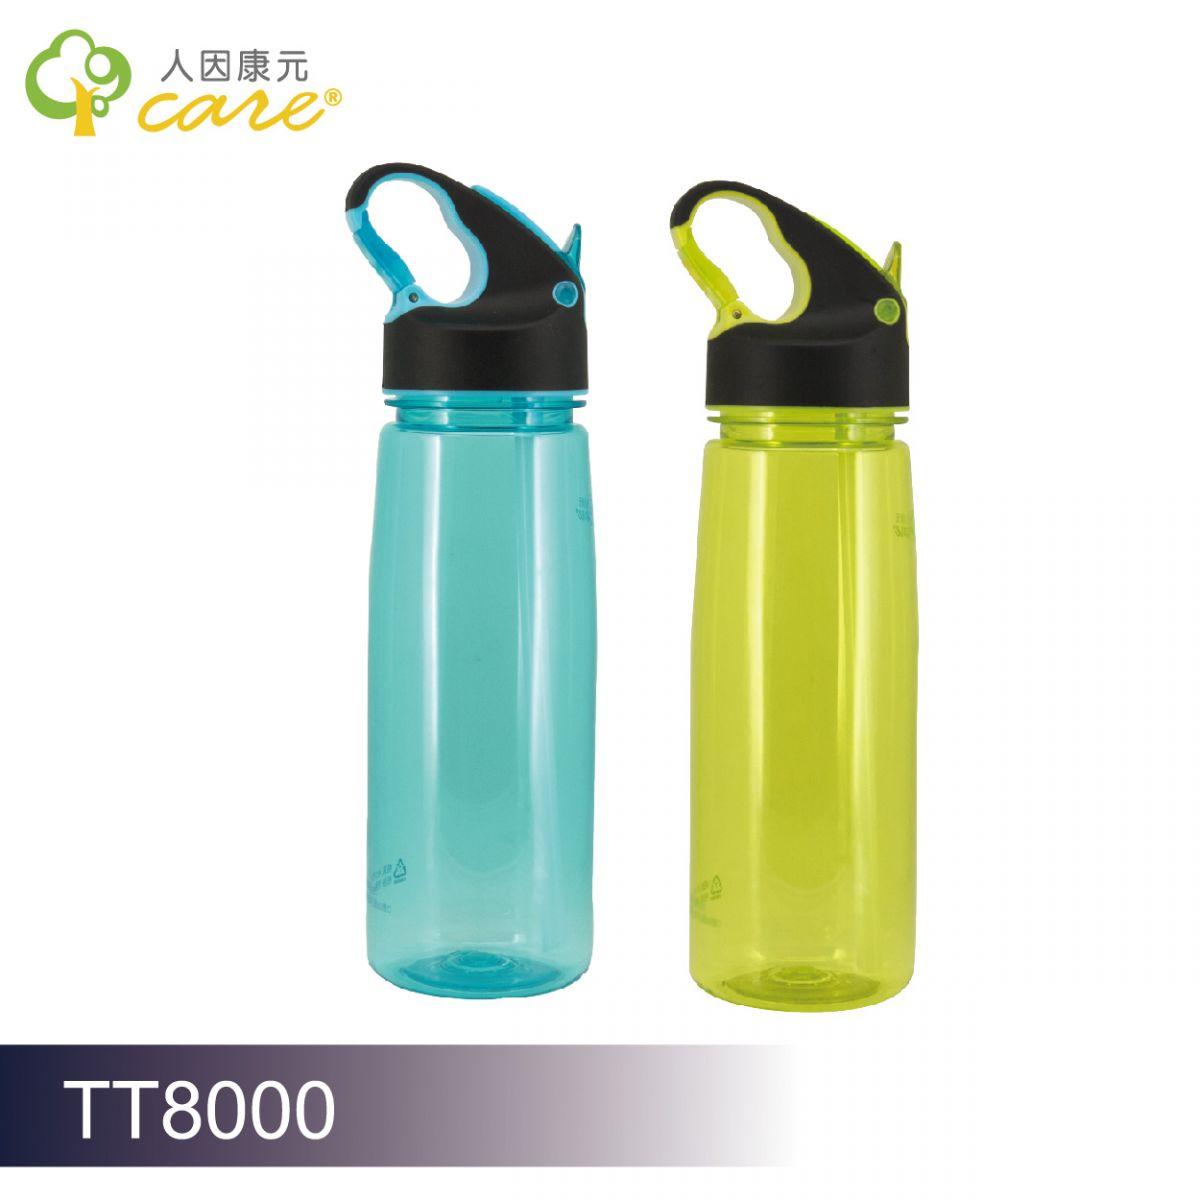 【ErgoCare】新負離子能量運動水壺 TT8000G 清新綠 800ml